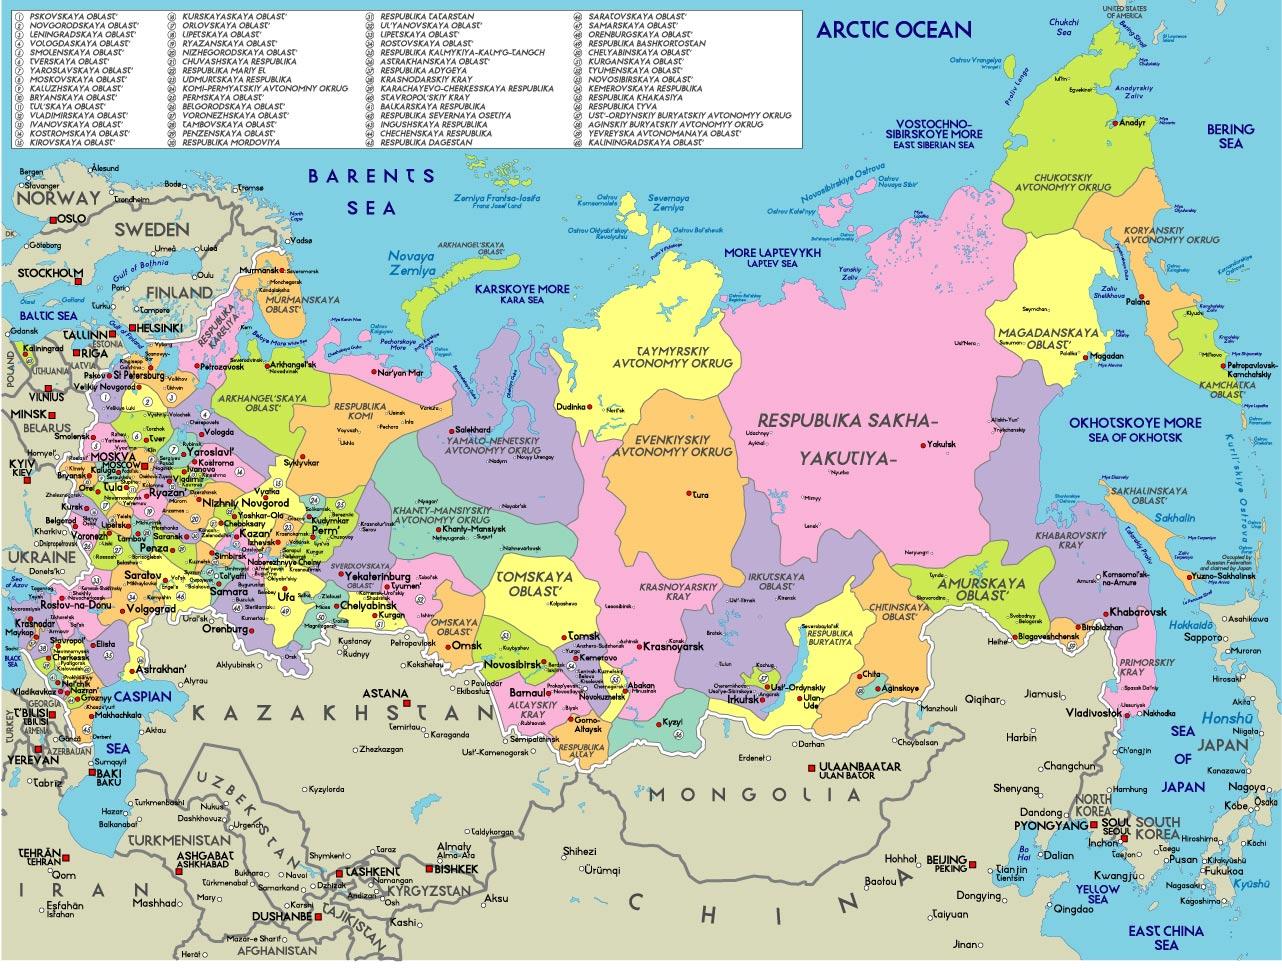 Mapa Politico De Rusia Actual.Diarios De V 2 0 Rossiya Kart Dlya Besplatnogo Skachivaniya